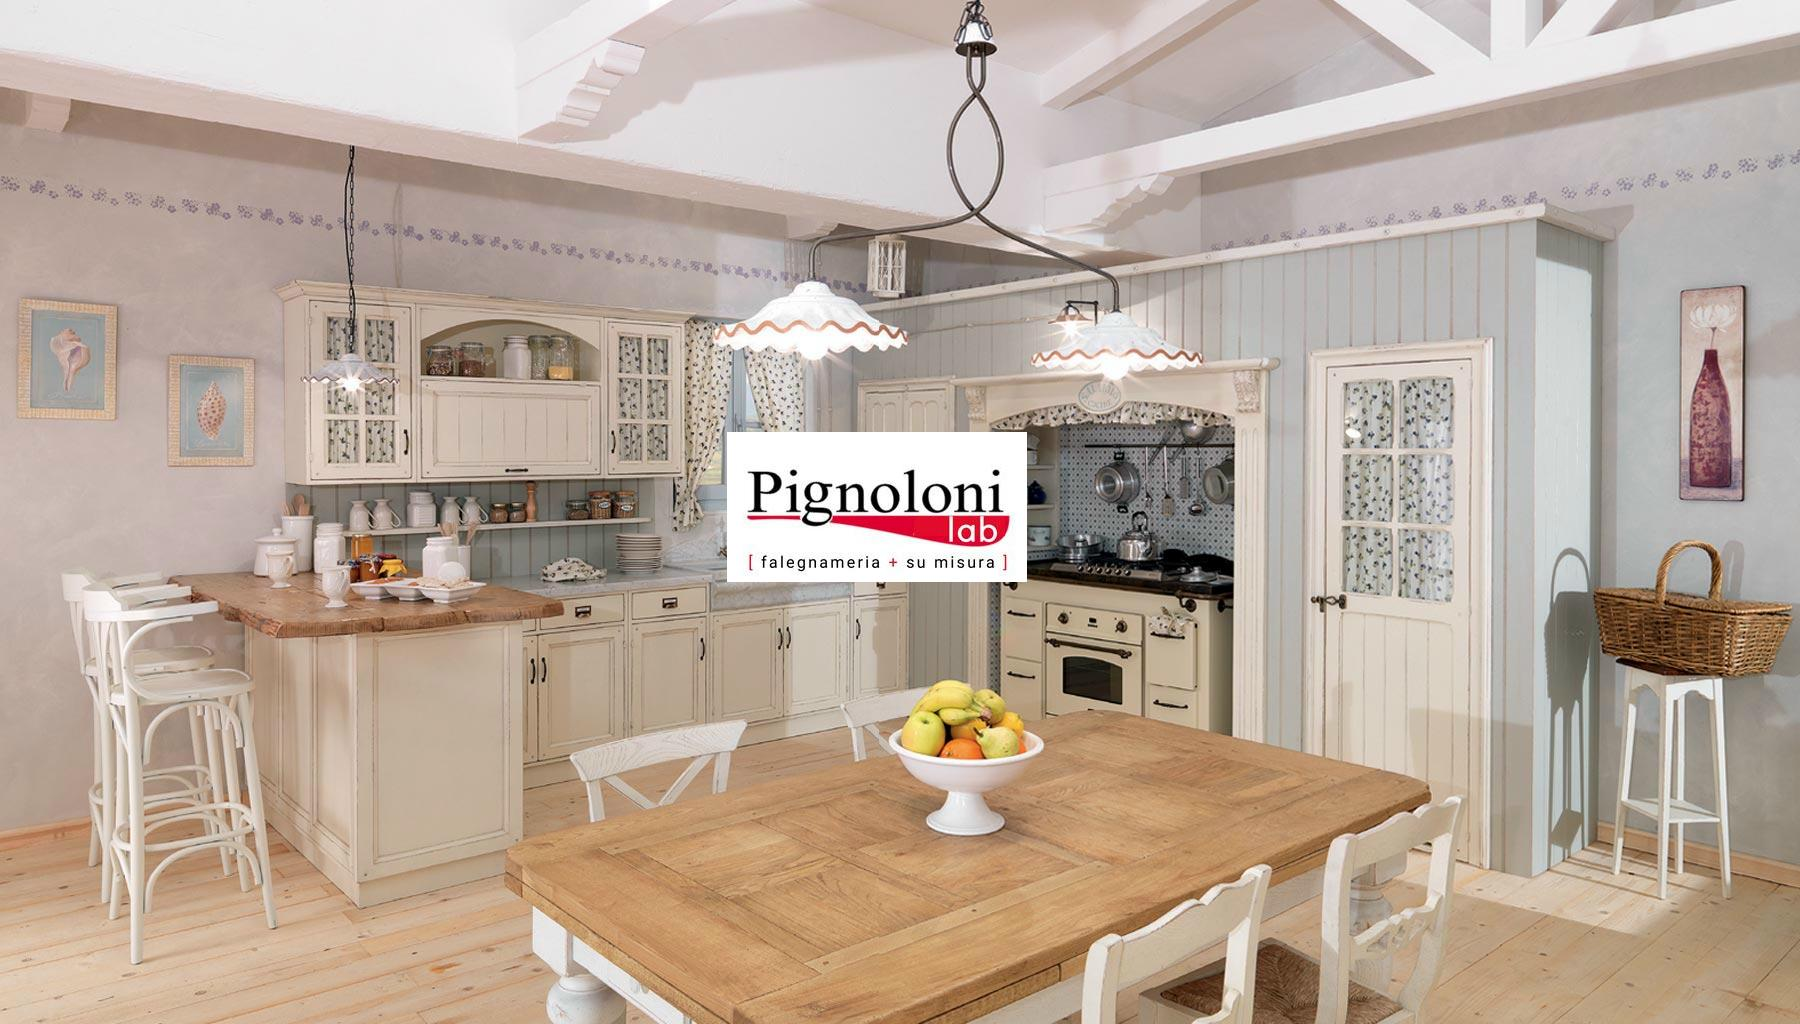 Falegnameria pignoloni pignoloni arreda for Pignoloni arredamenti